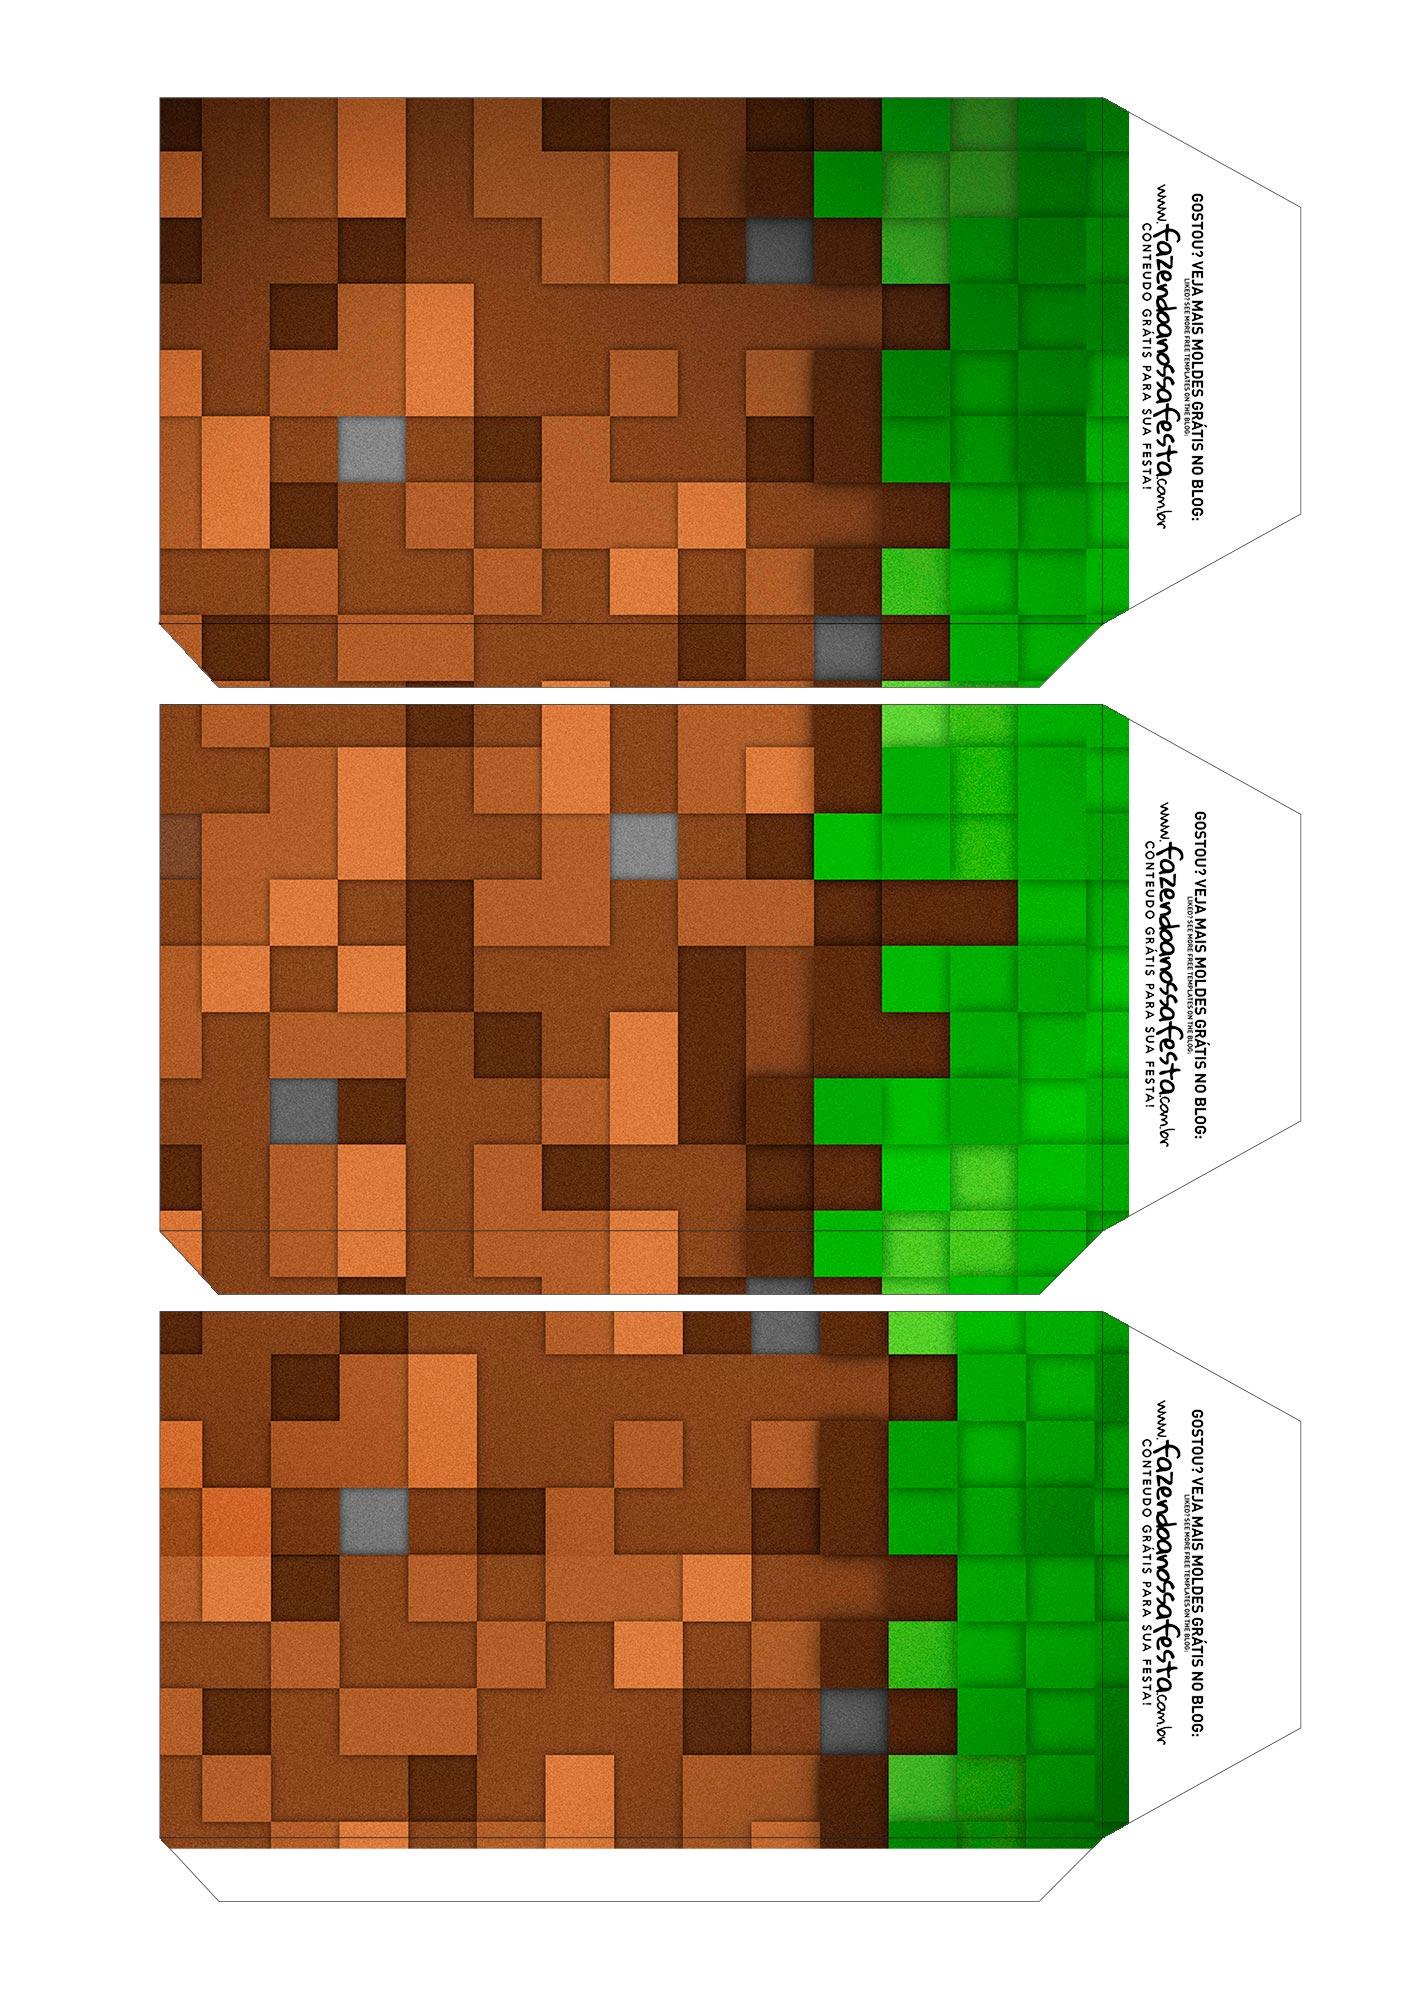 Caixa Explosiva Pascoa Minecraft 5